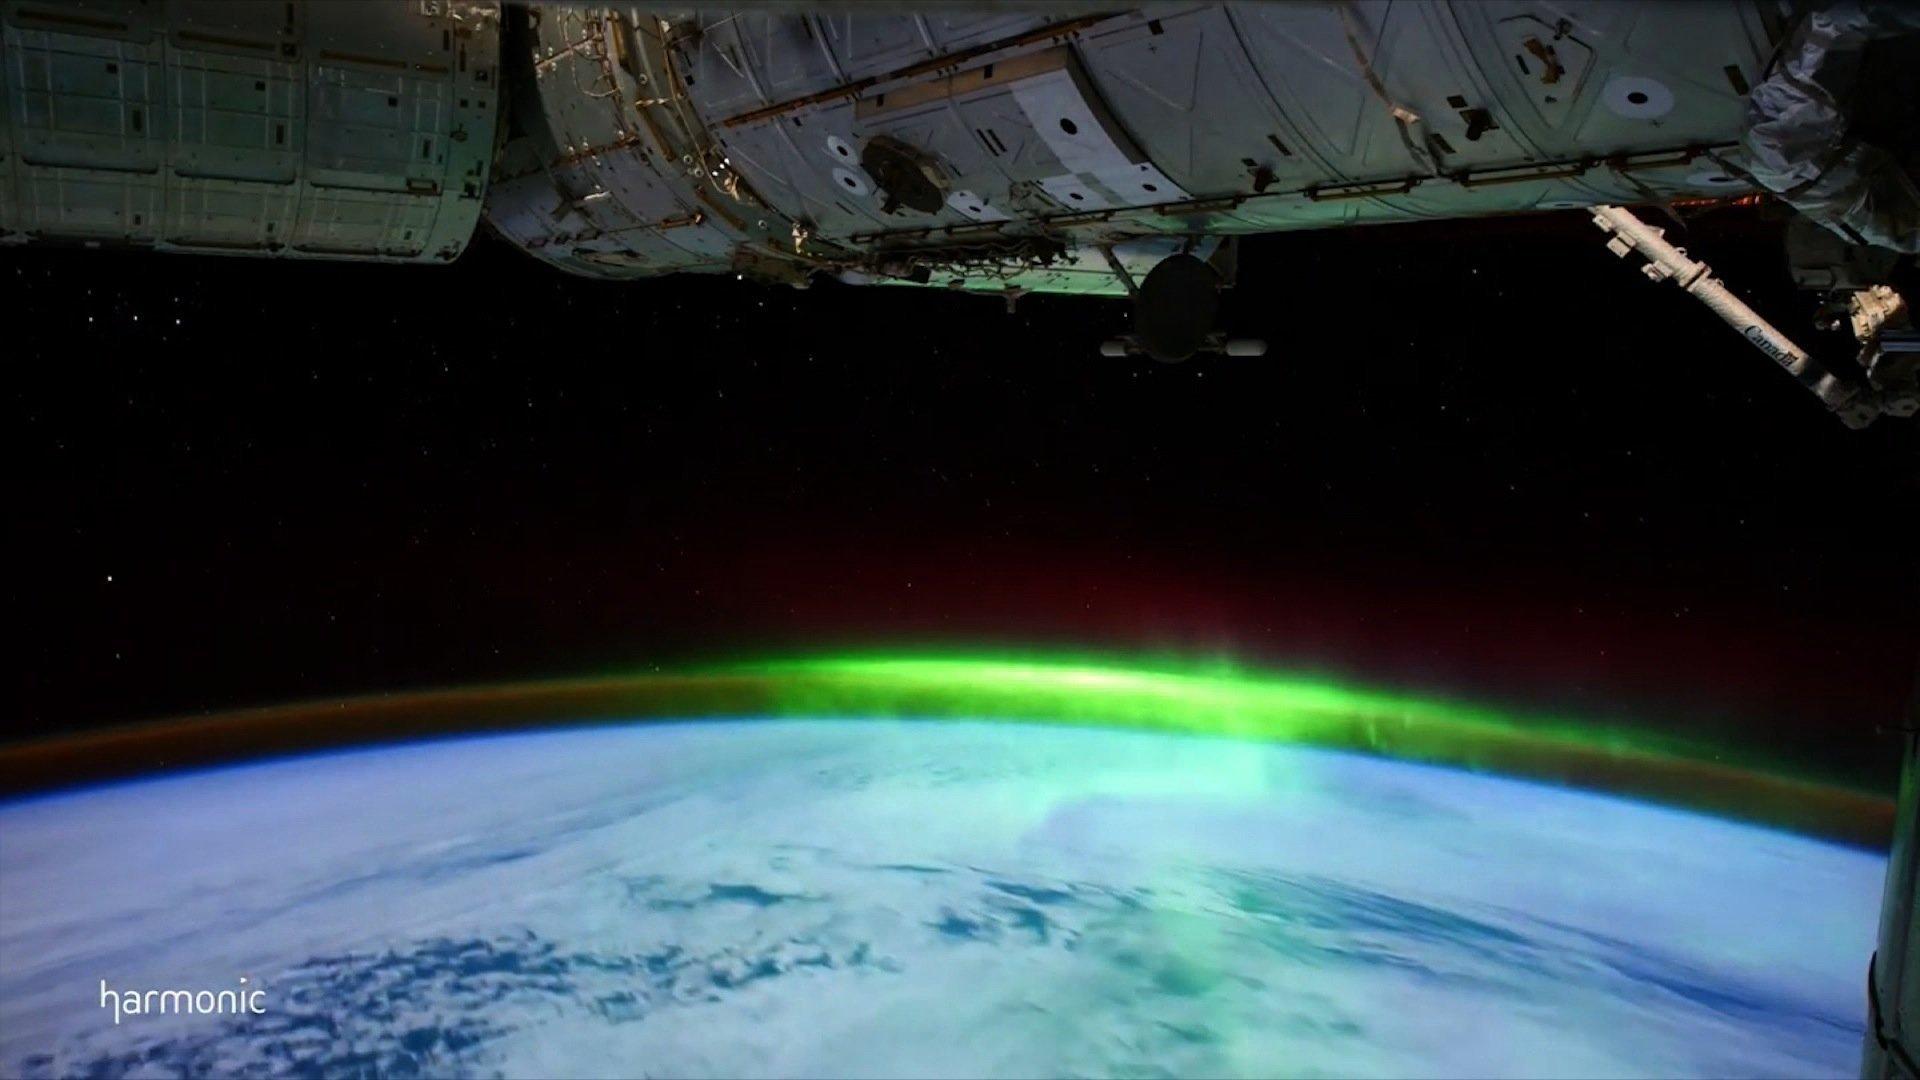 NASA has released a video shot in space of the Aurora Borealis and Aurora Australis phenomena (Source: CNN)